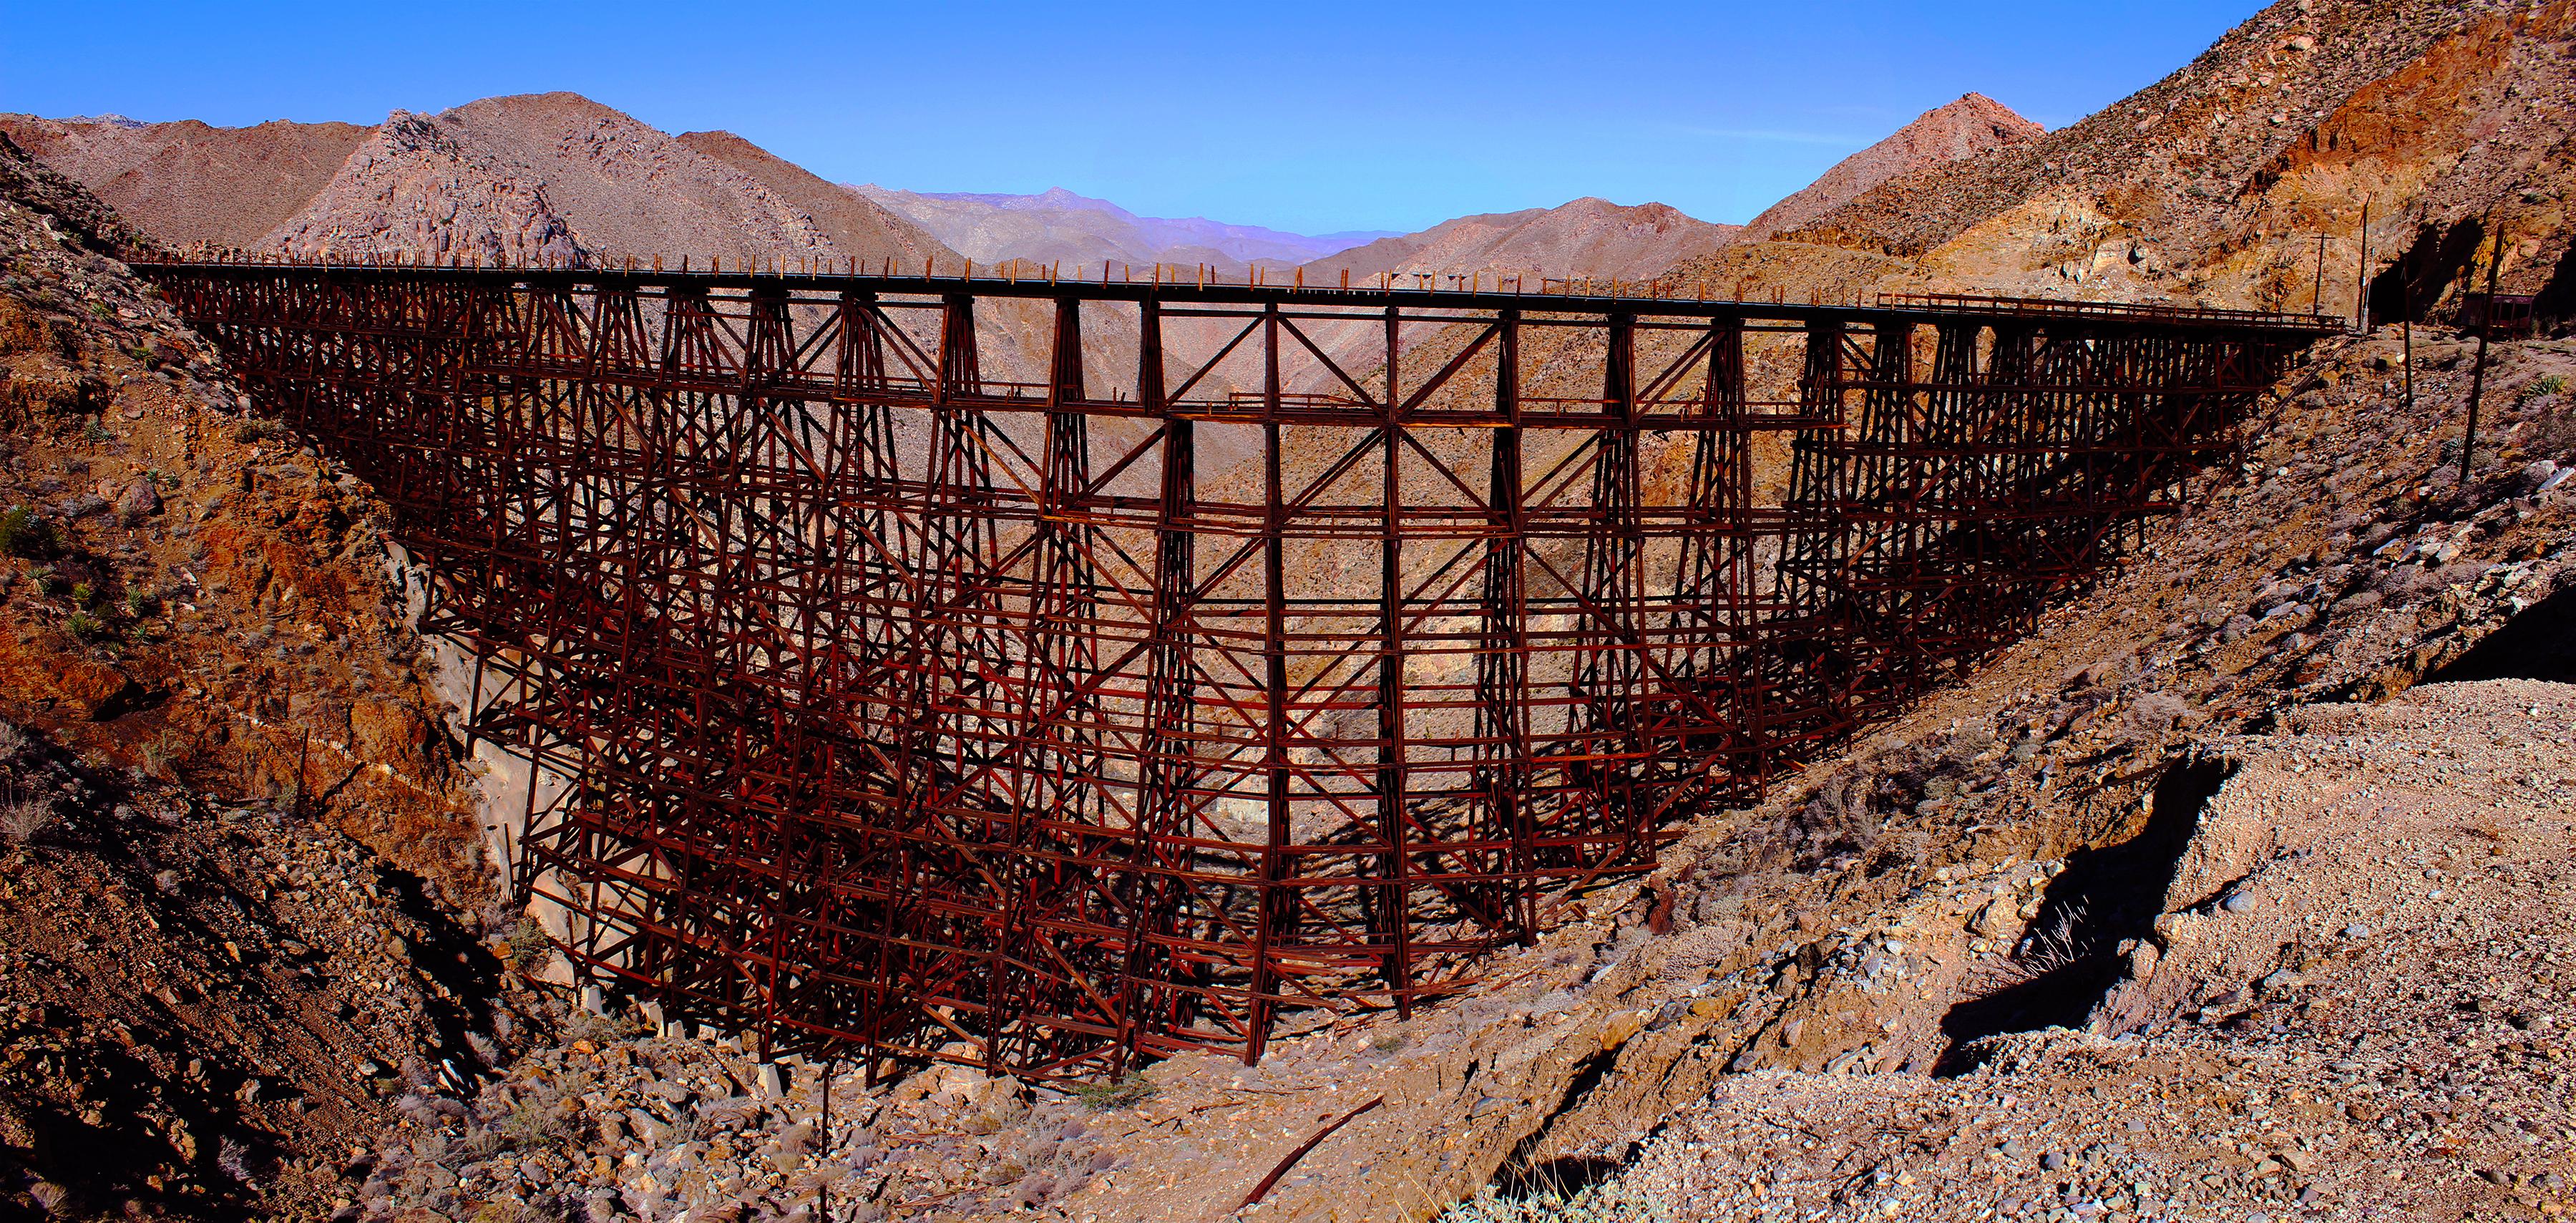 Goat Canyon Trestle - Wikipedia